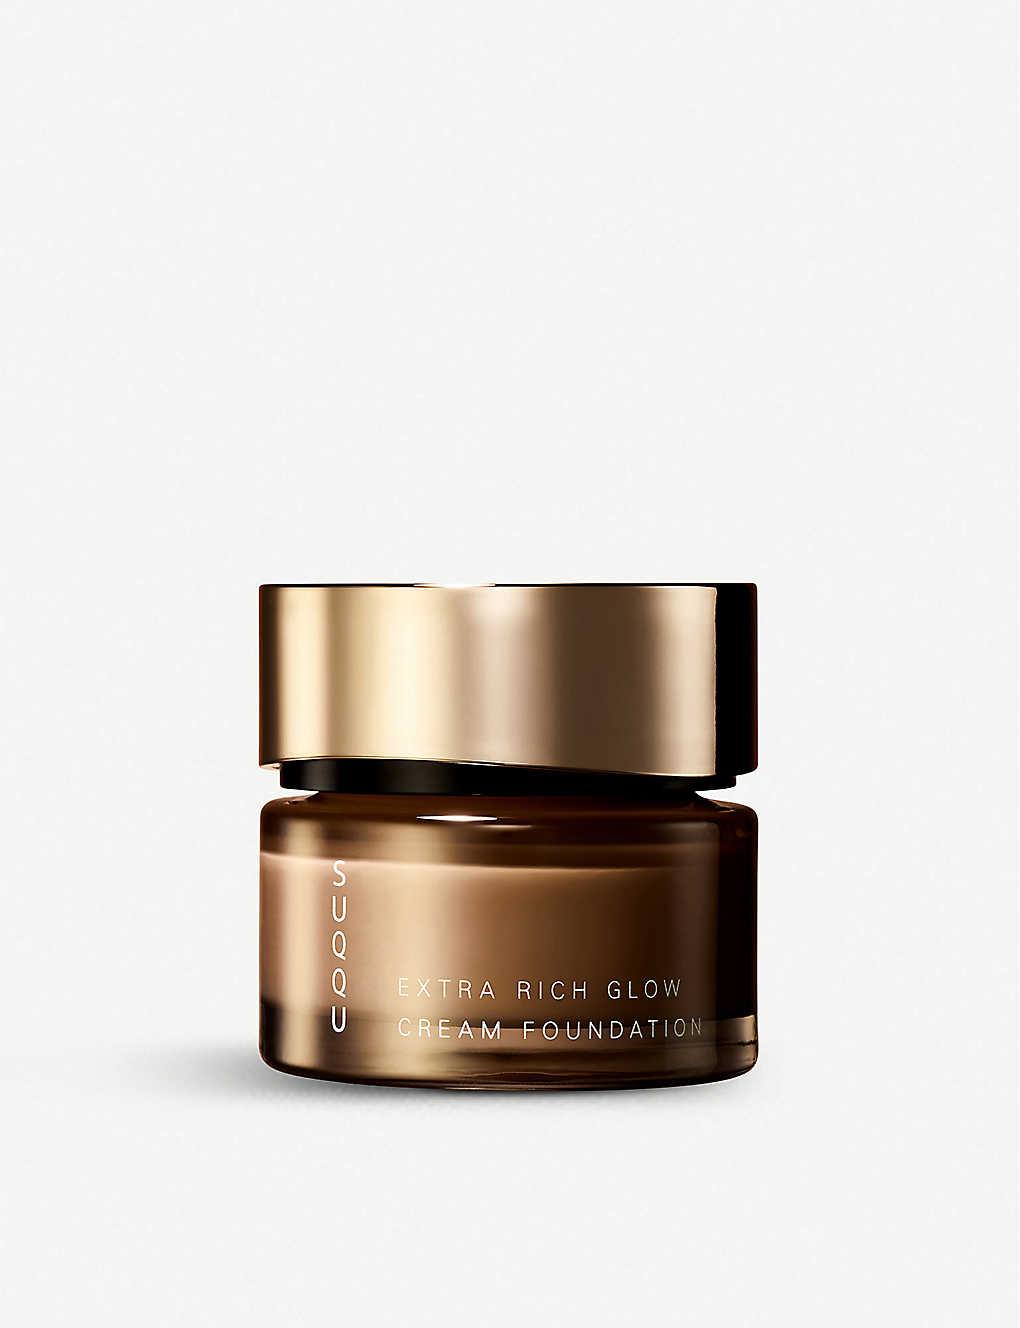 Extra Rich Glow Cream Foundation 30g